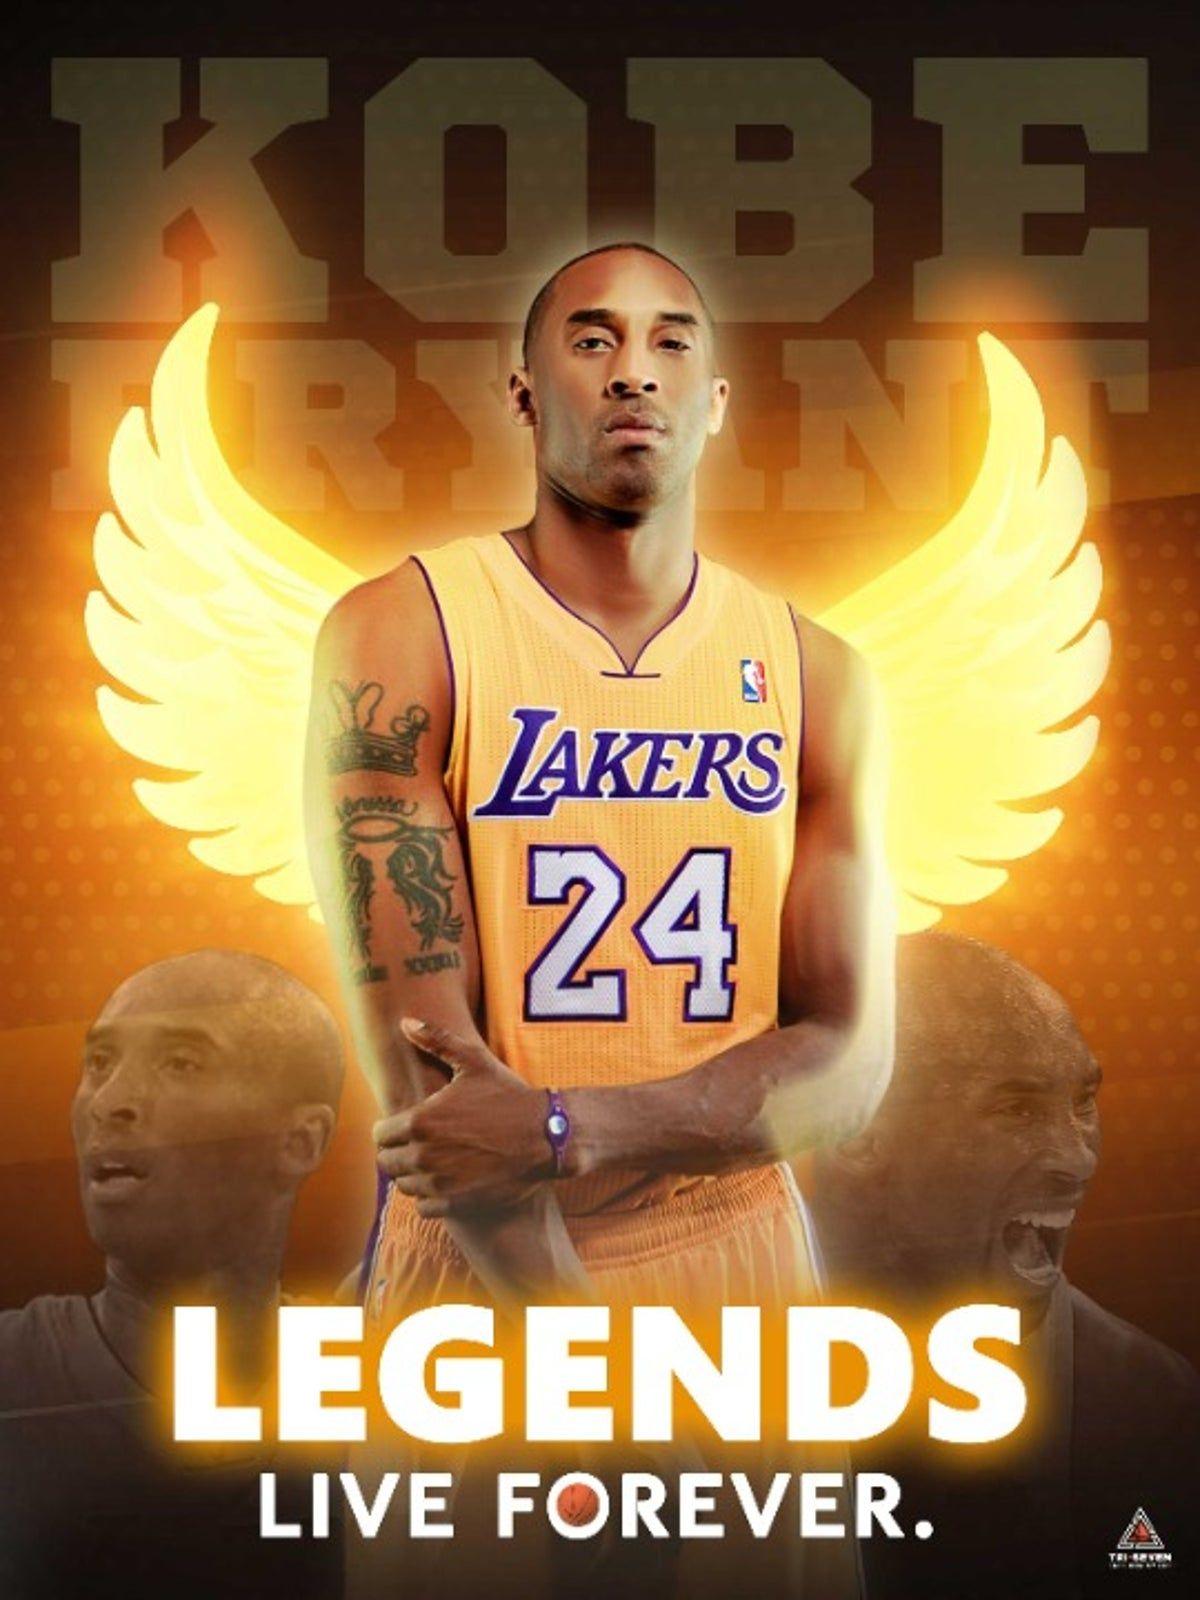 Kobe Poster Legends Live Forever (1) in 2020 Kobe bryant